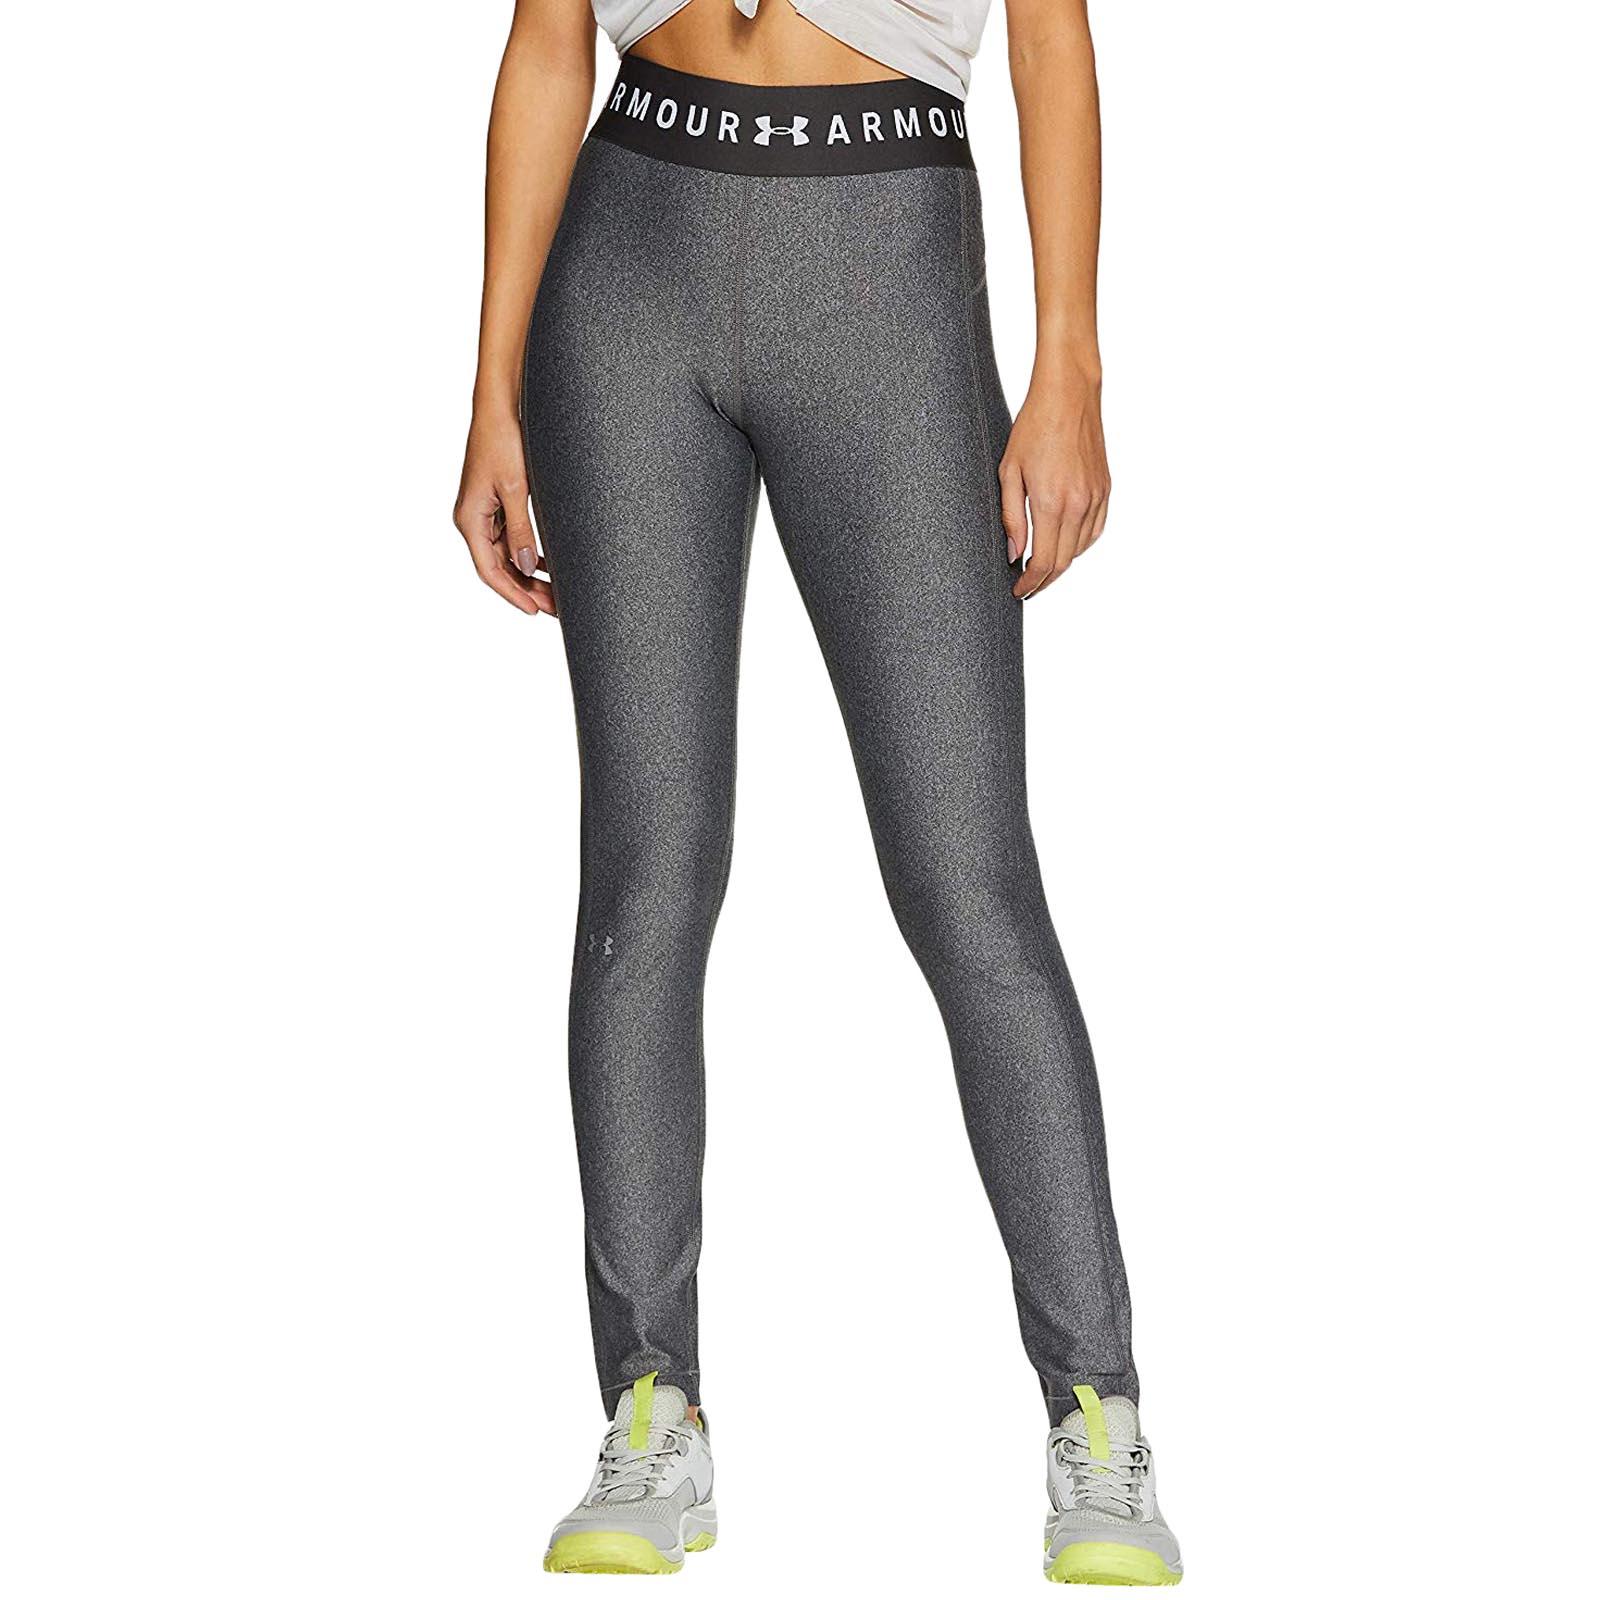 Under Armour Track Pants & Jeans Leggings | JD Sports Ireland